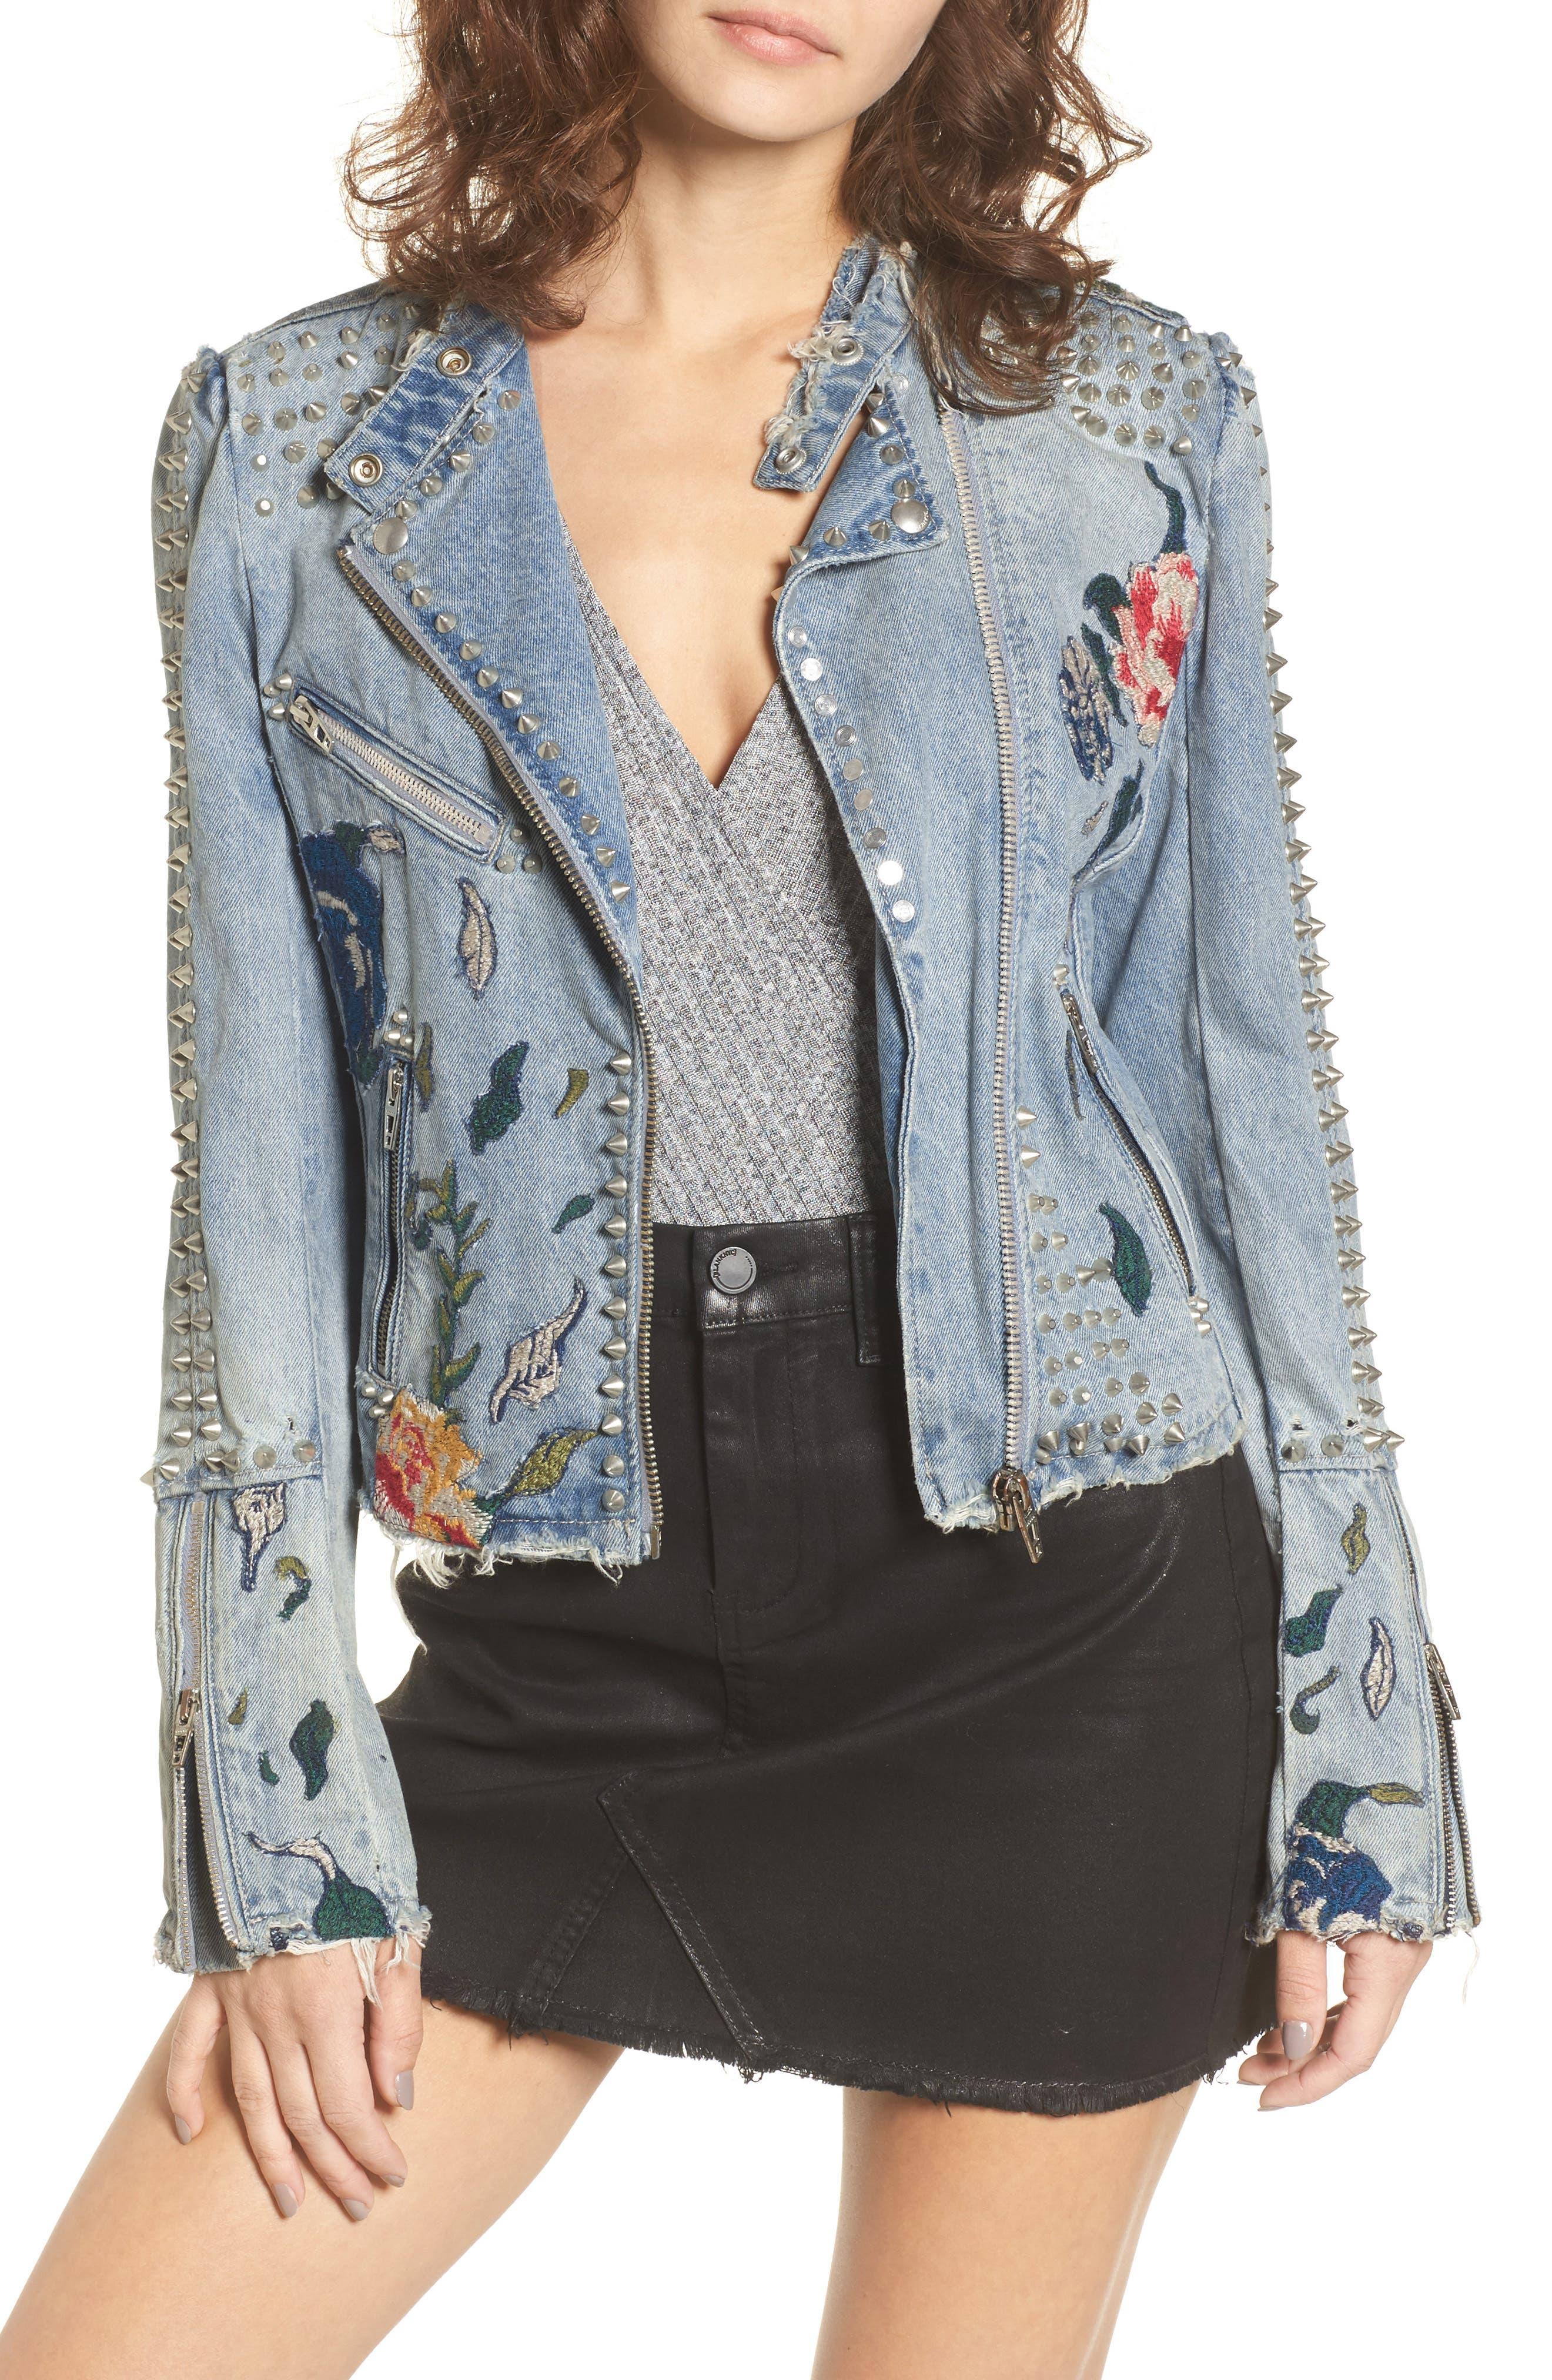 Main Image - BLANKNYC Sea of Flowers Studded Denim Moto Jacket